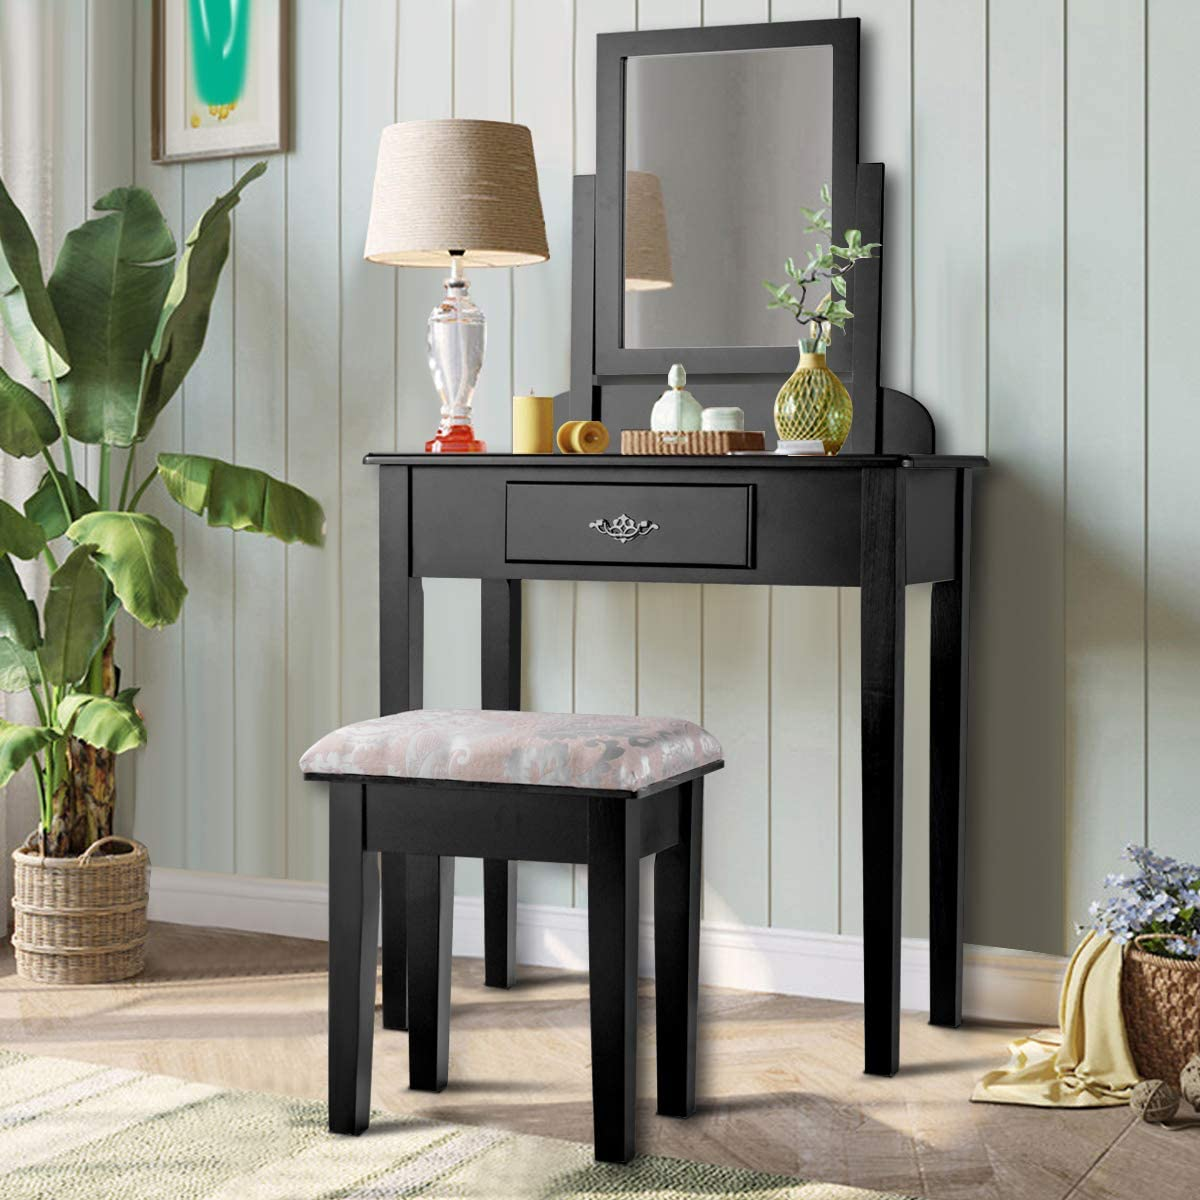 Giantex Vanity Dressing Table Stool Fu Set Vanities Manufacturer regenerated product for Bedroom Genuine Free Shipping